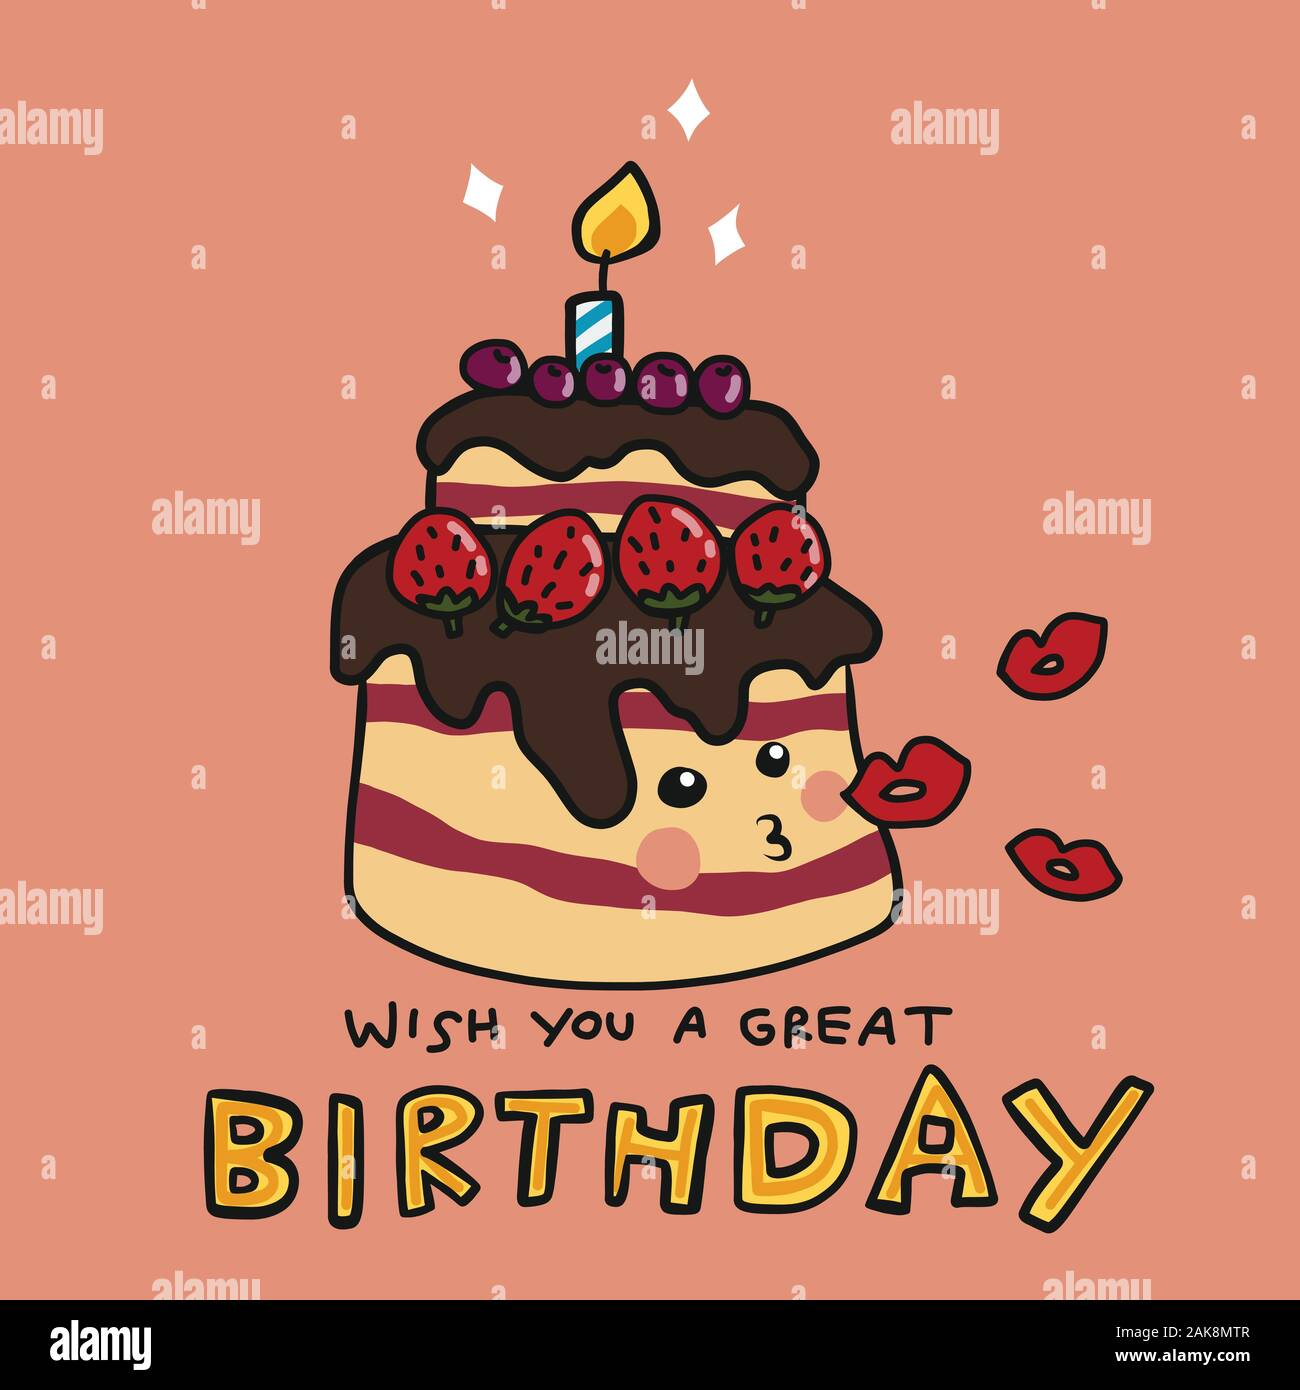 Enjoyable Wish You A Great Birthday Cake Kissing Cartoon Vector Illustratio Funny Birthday Cards Online Overcheapnameinfo